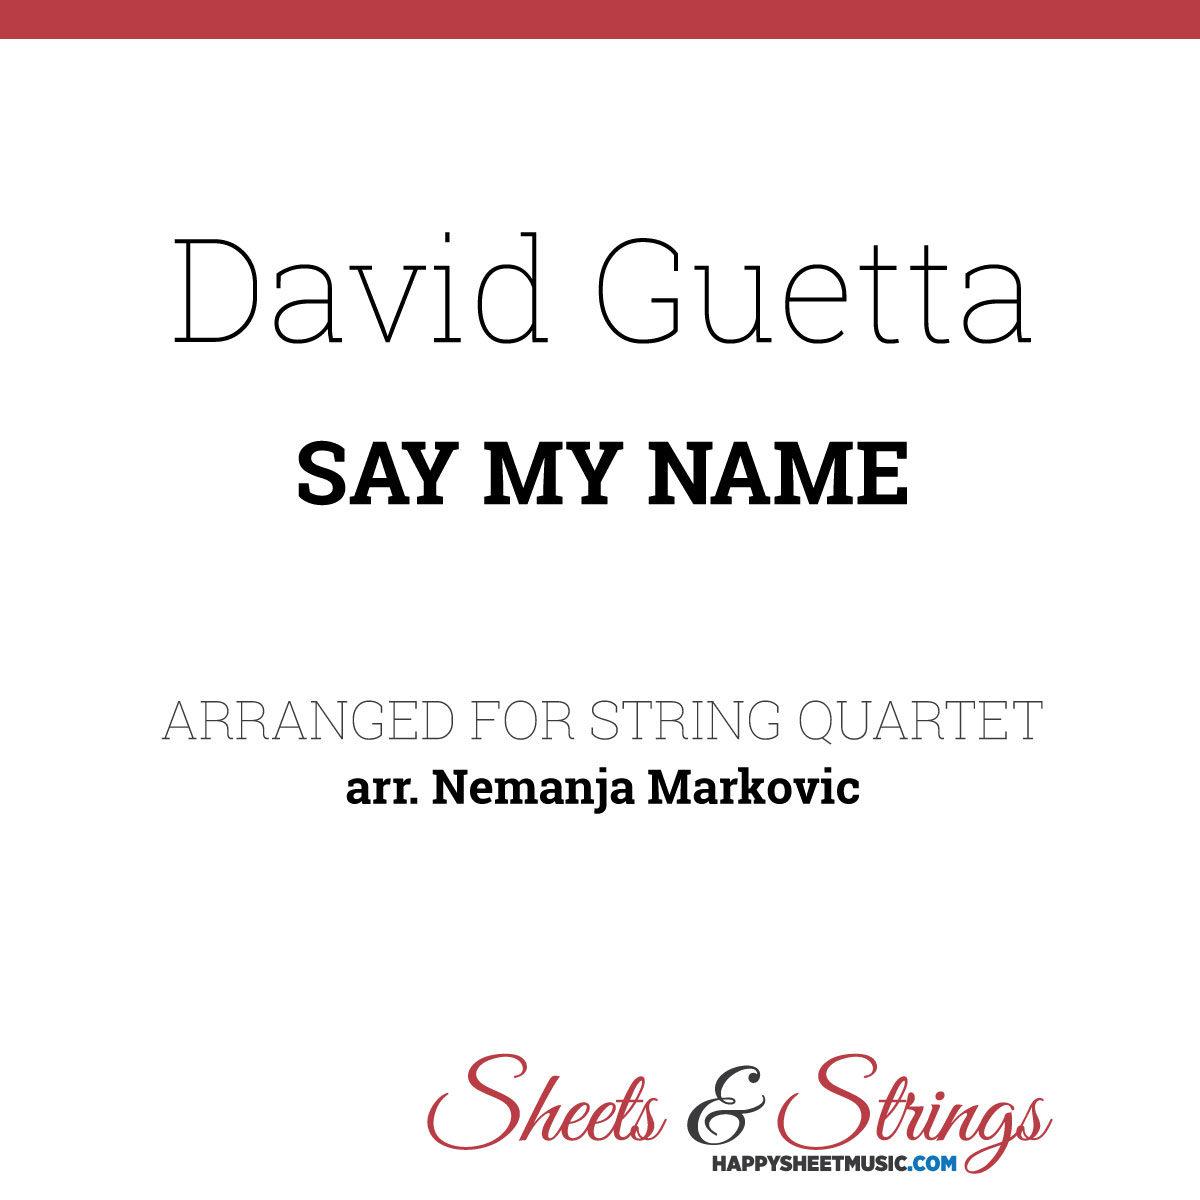 David Guetta ft. J Balvin and Bebe Rexha - Sheet Music for String Quartet - Music Arrangement for String Quartet